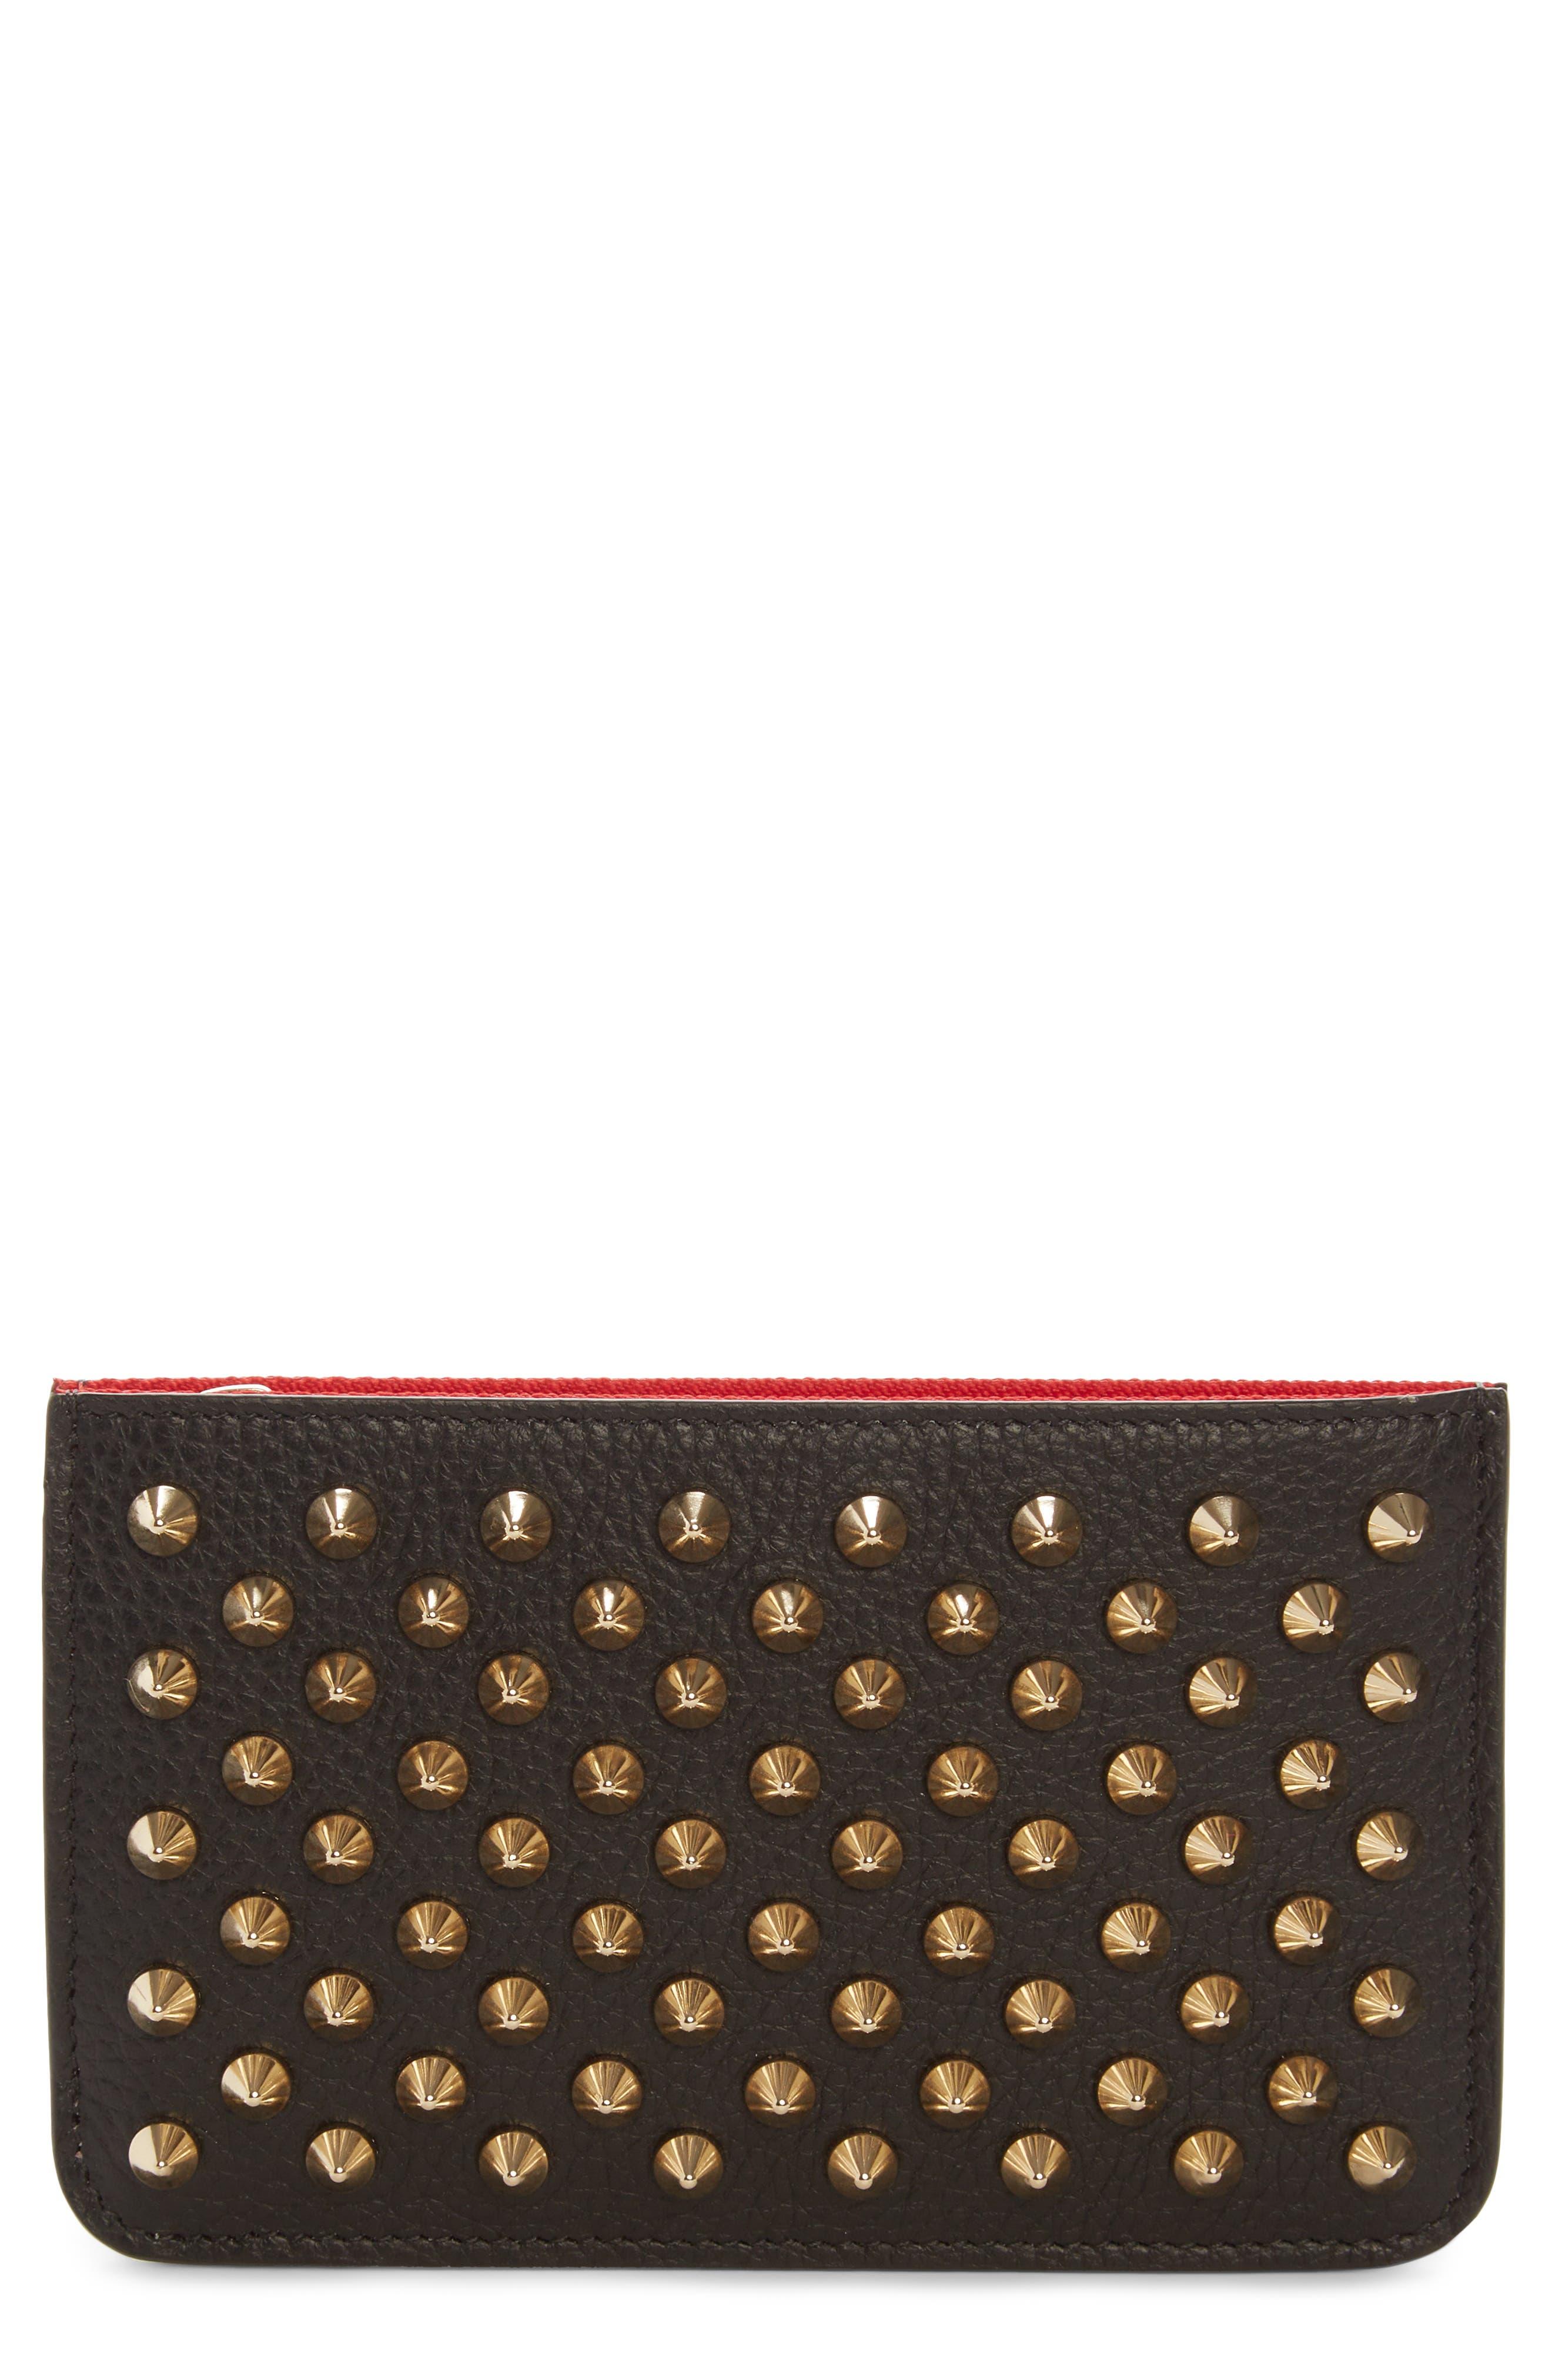 Main Image - Christian Louboutin Panettone Studded Leather Key Case